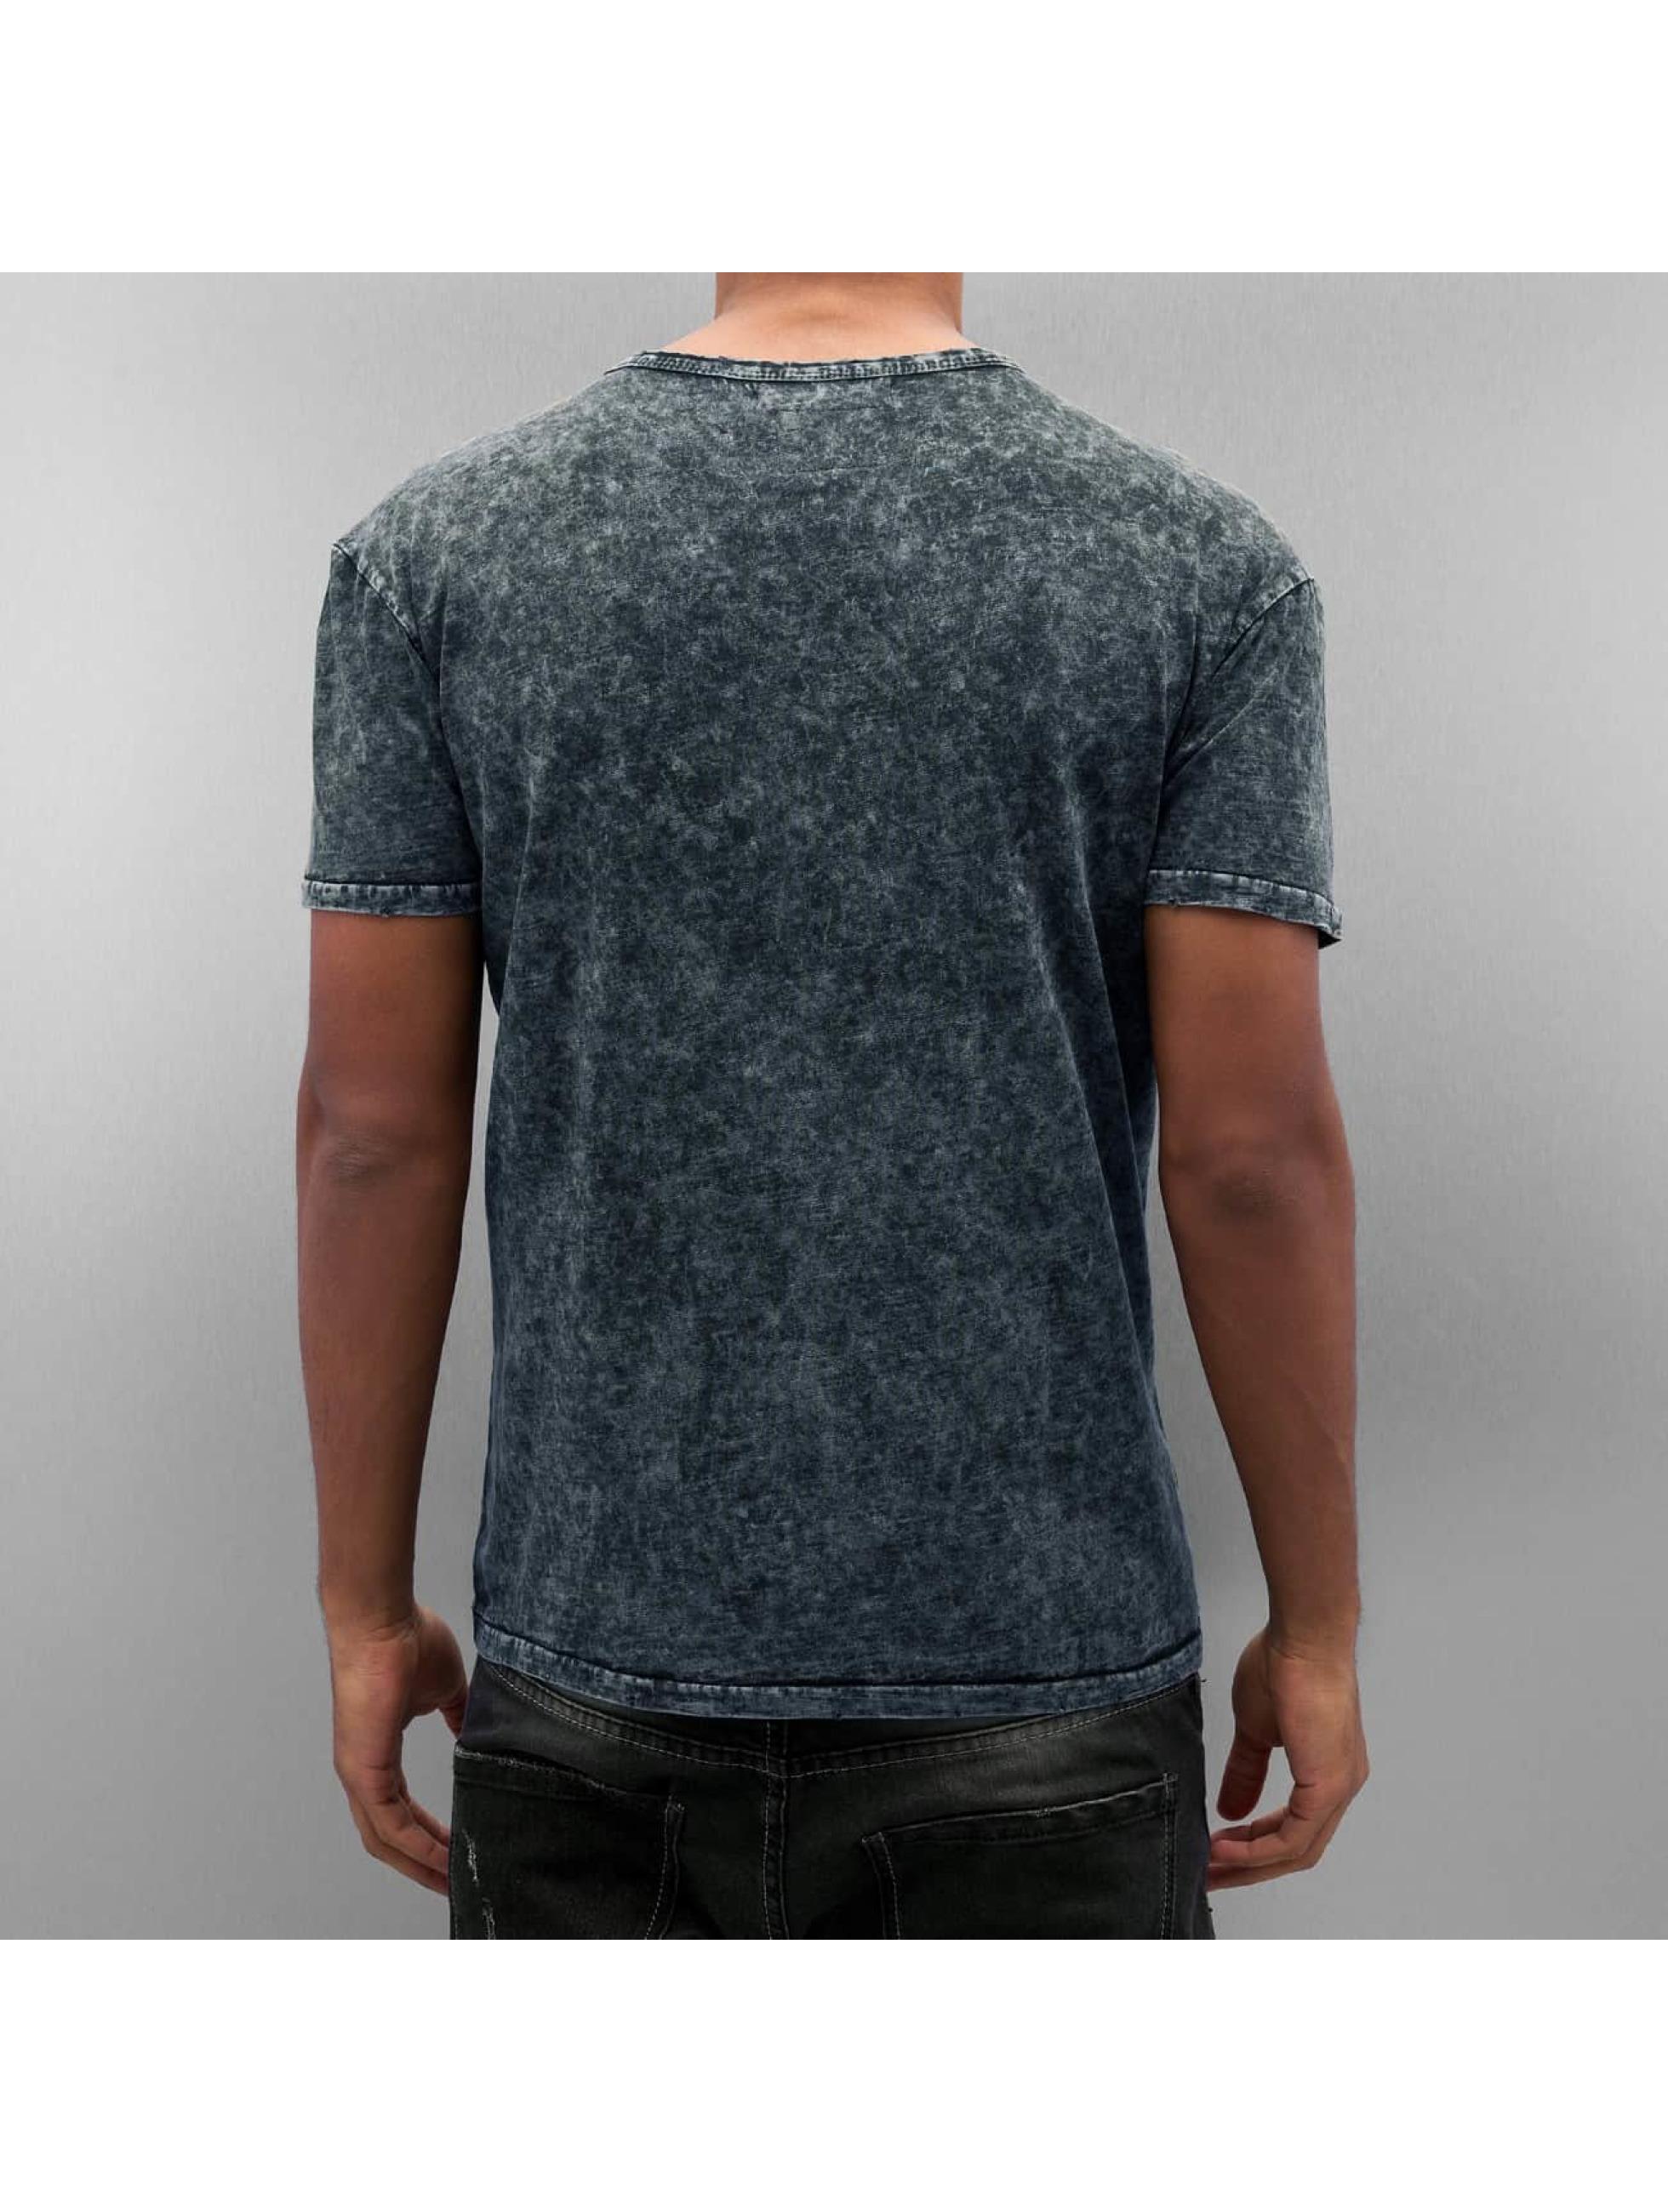 Amsterdenim t-shirt Jaap blauw